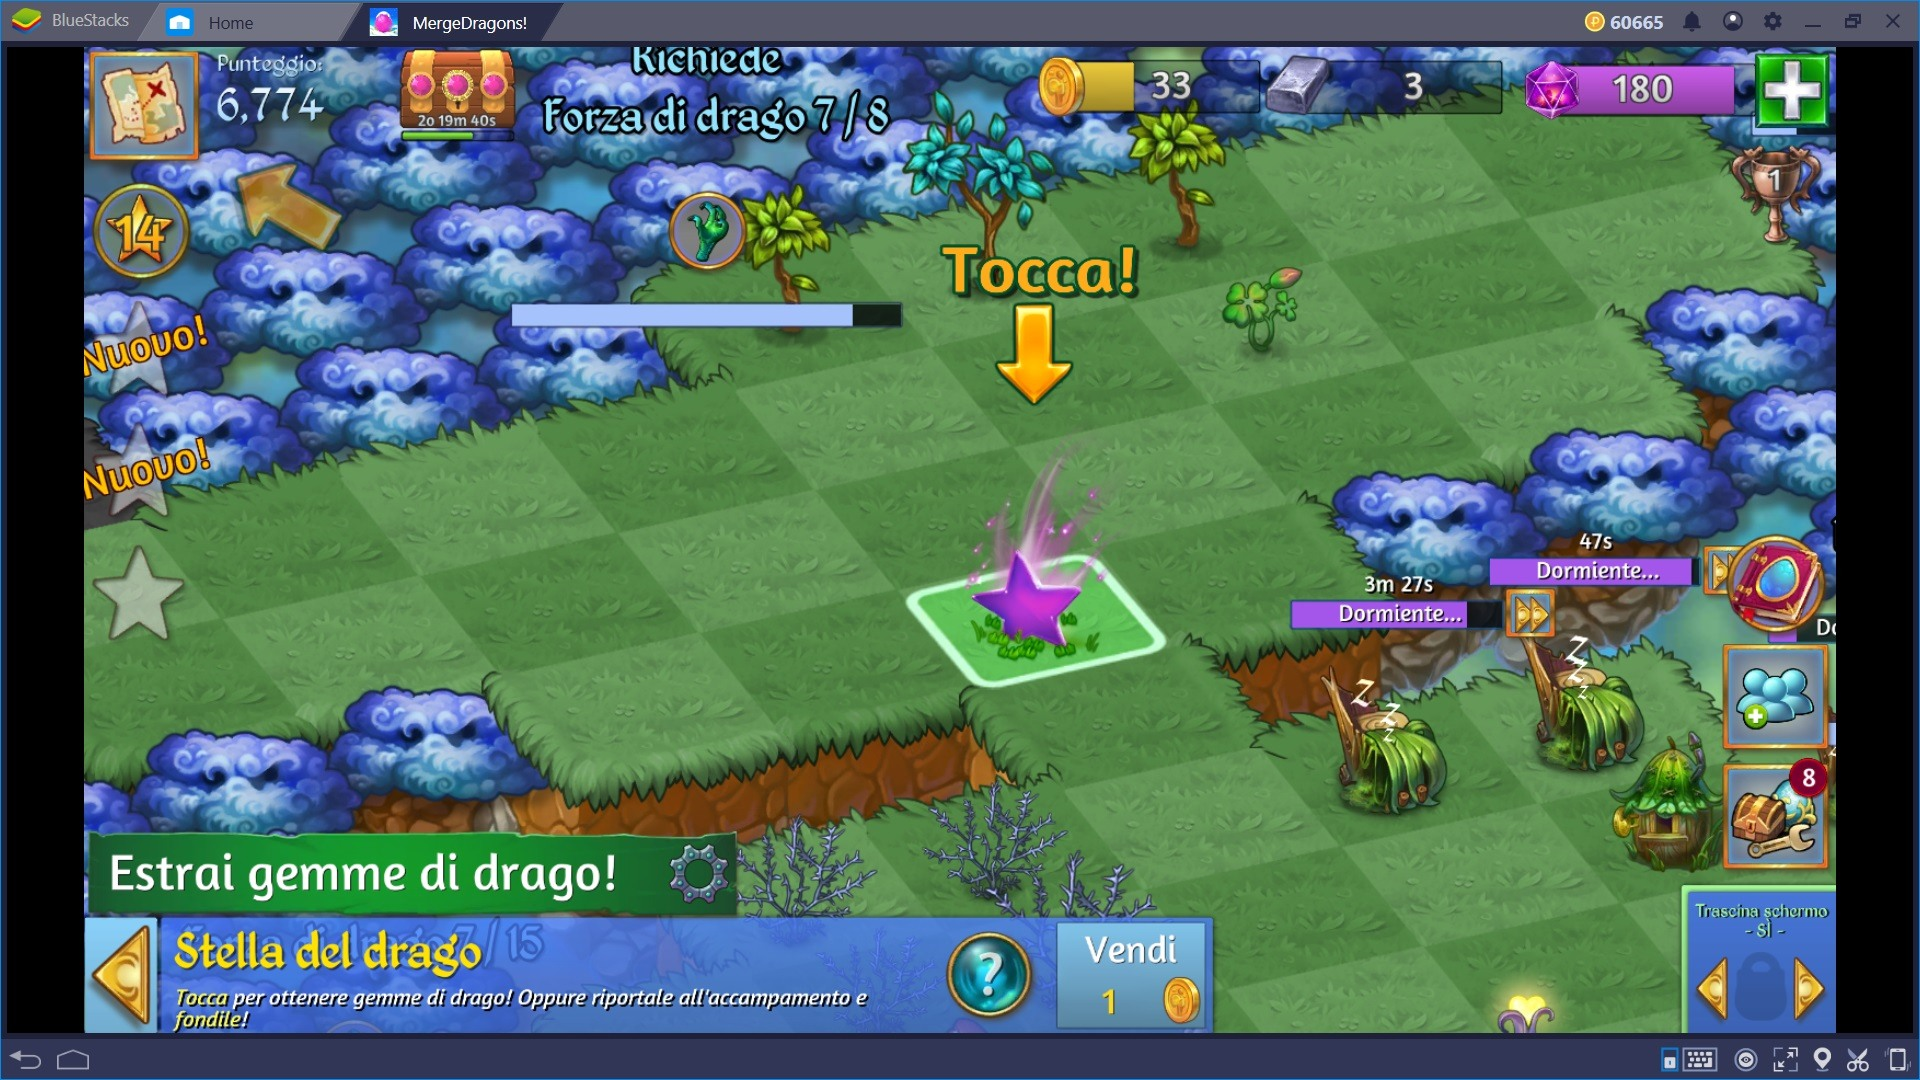 Trucchi e Consigli per Merge Dragons!